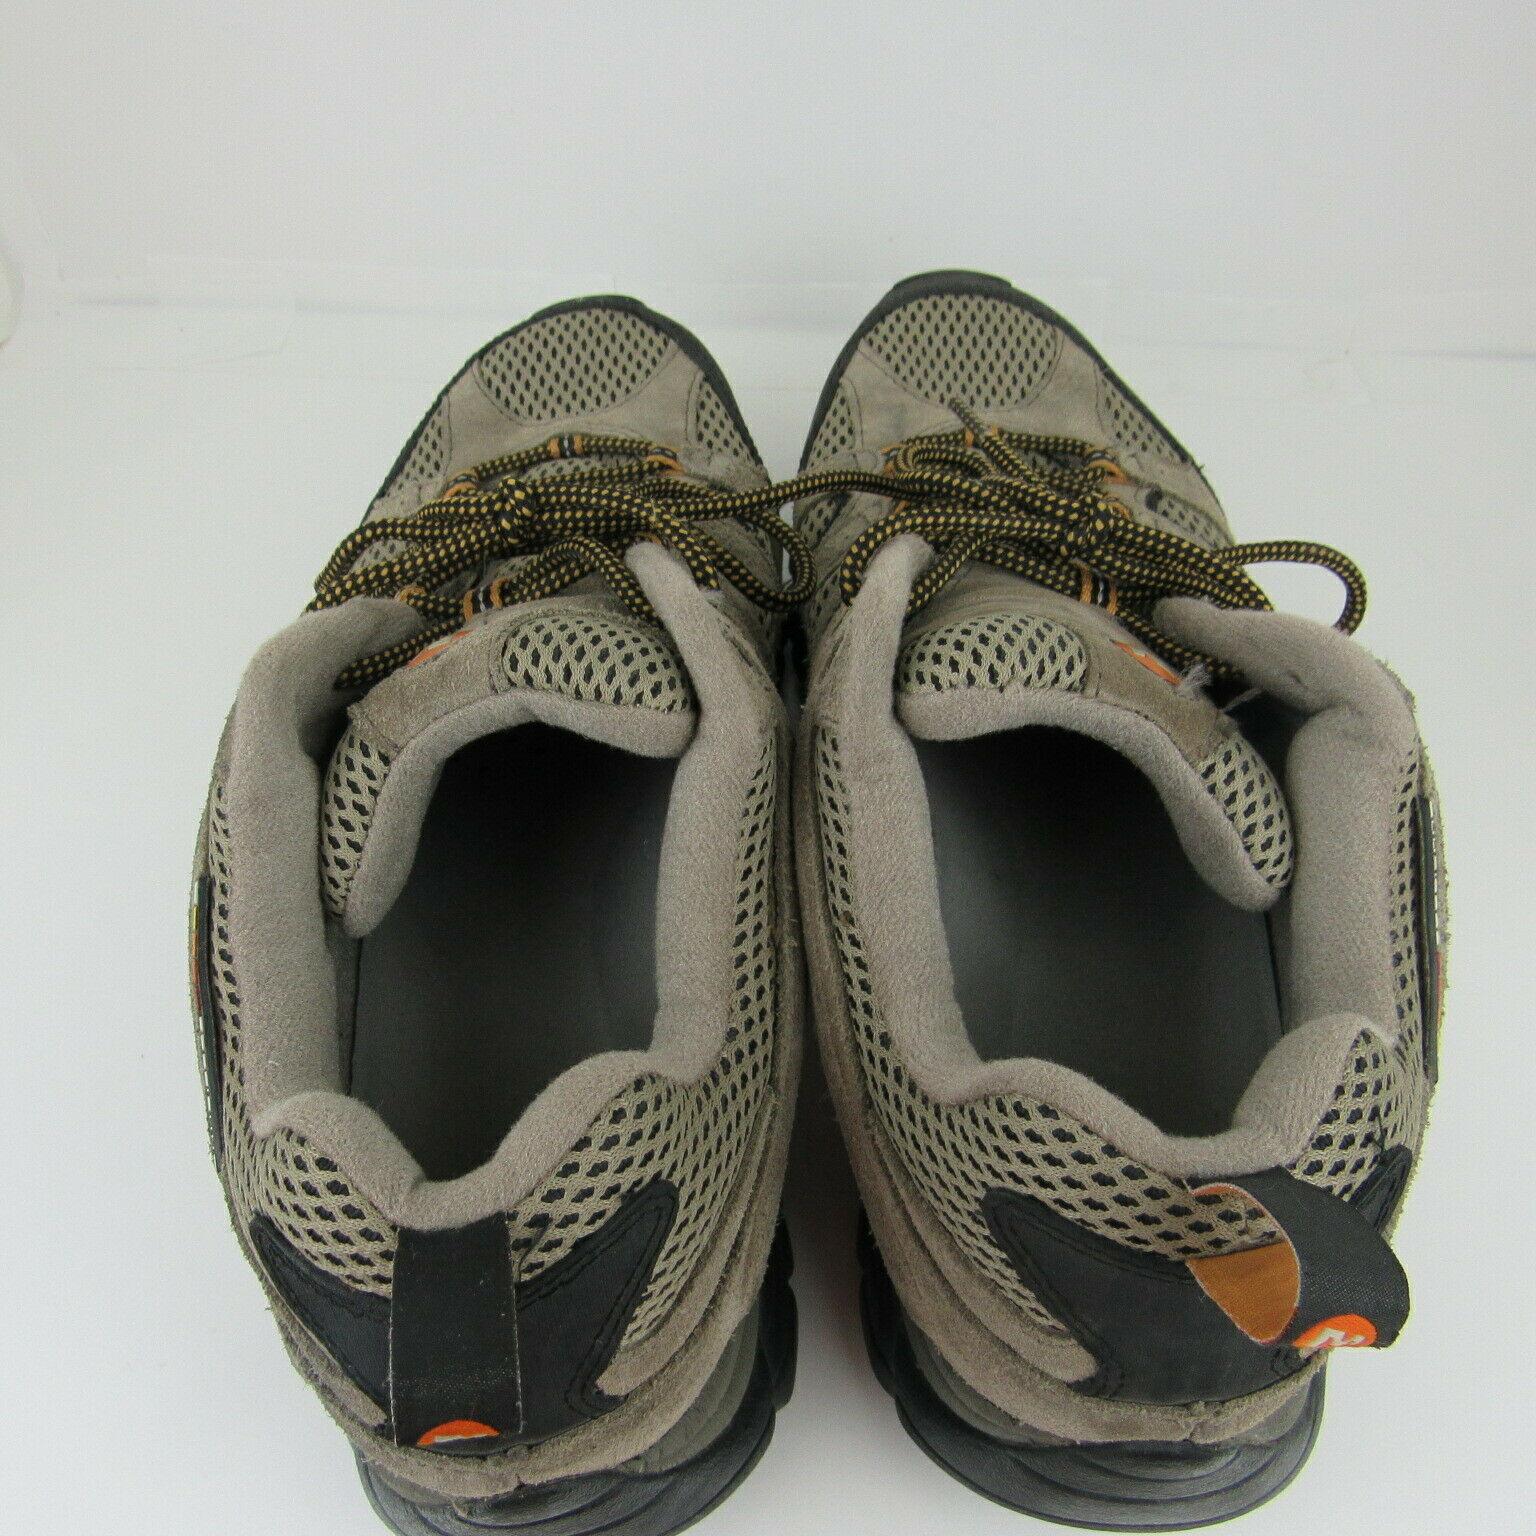 Merrell Moab 2 Ventilator Walnut Hiking Shoe Mens Size 13 EU 48 Laces Beige